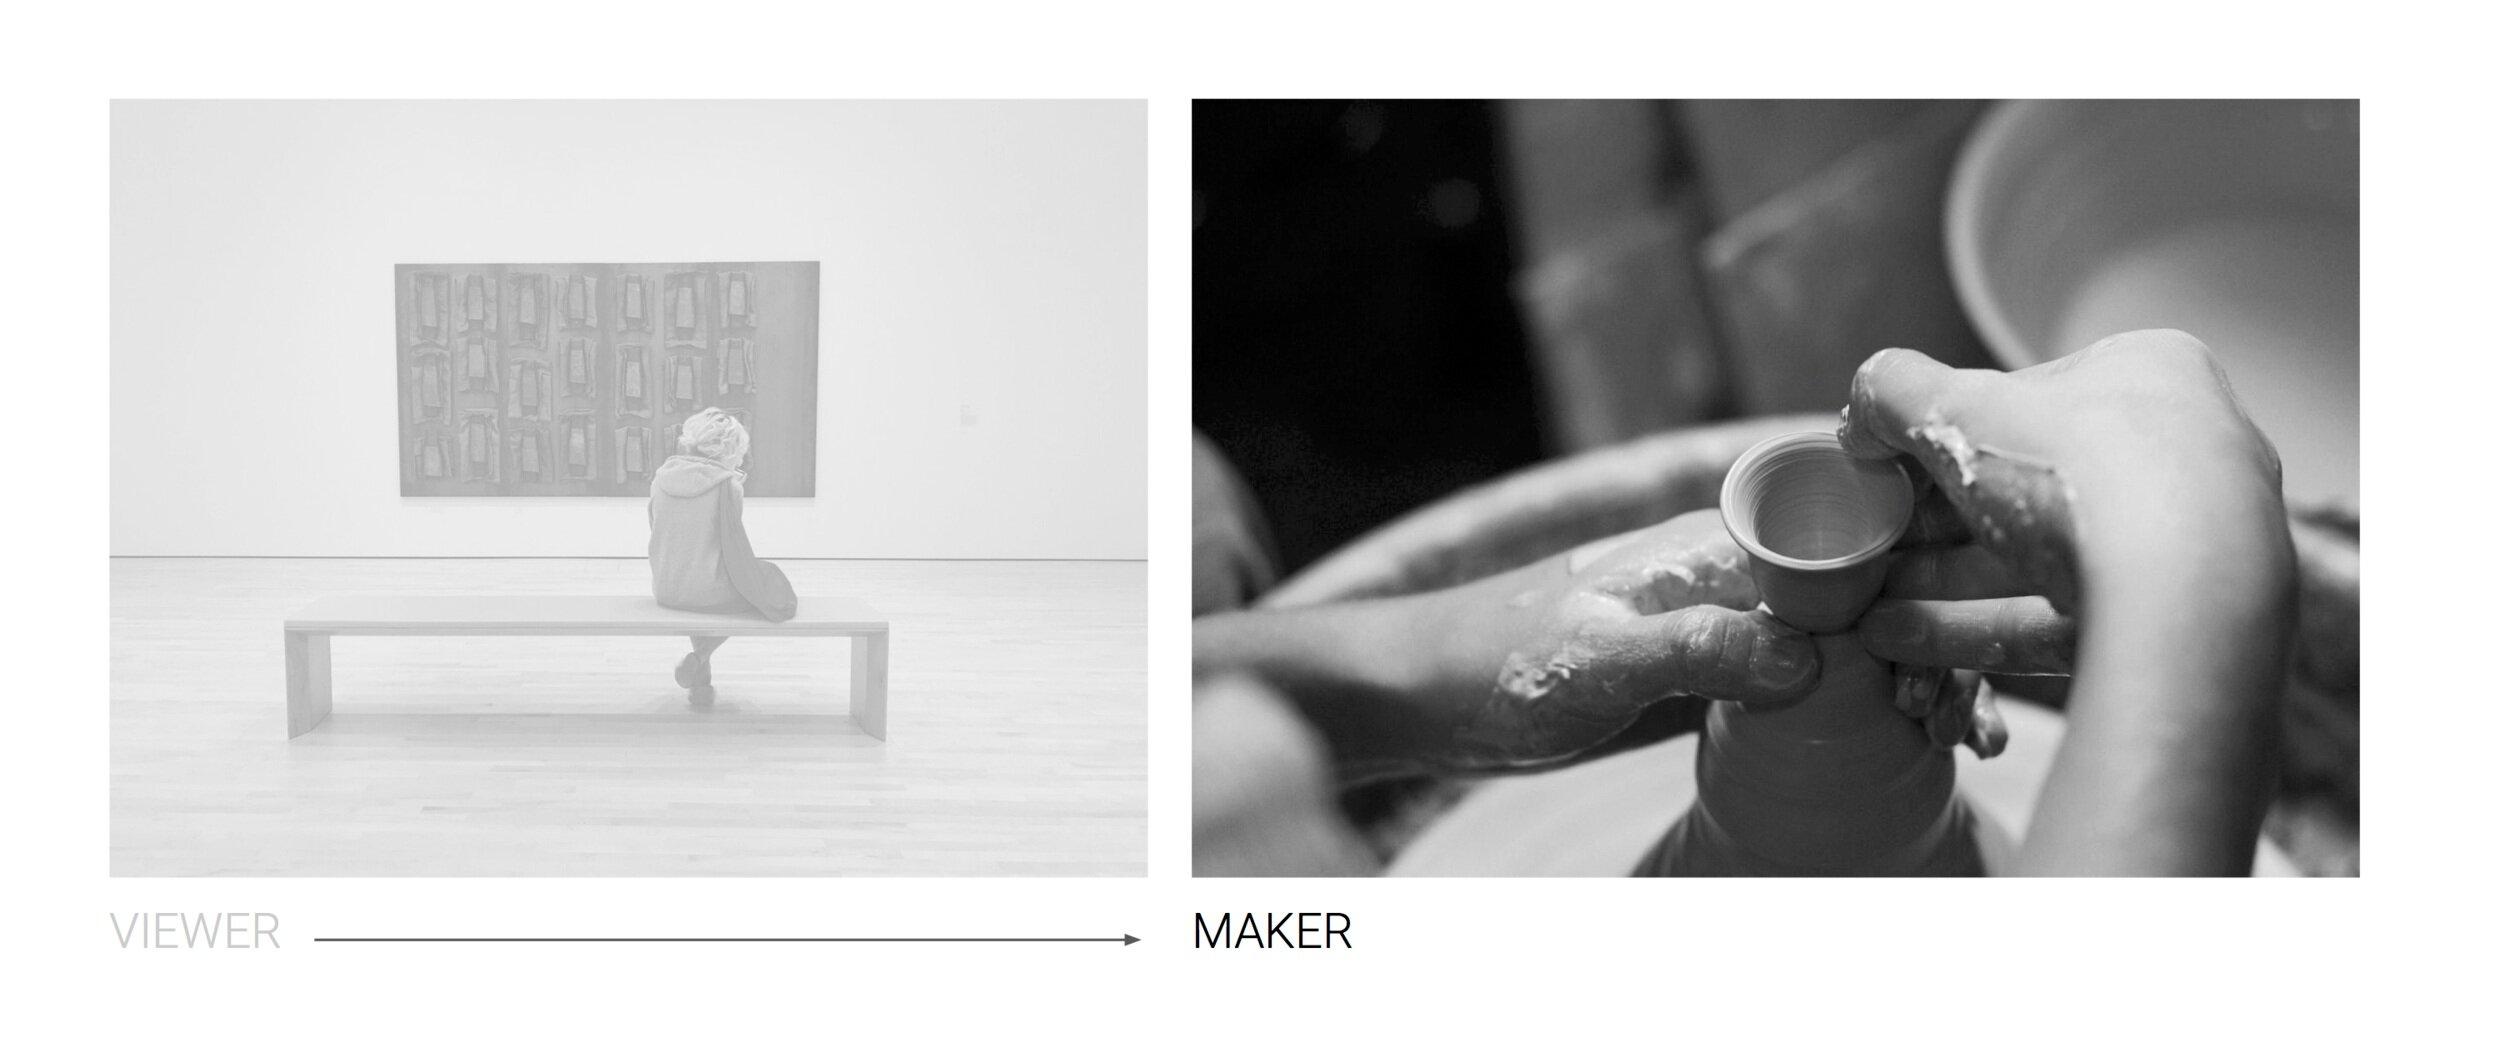 viewer+maker+black+and+white.jpg